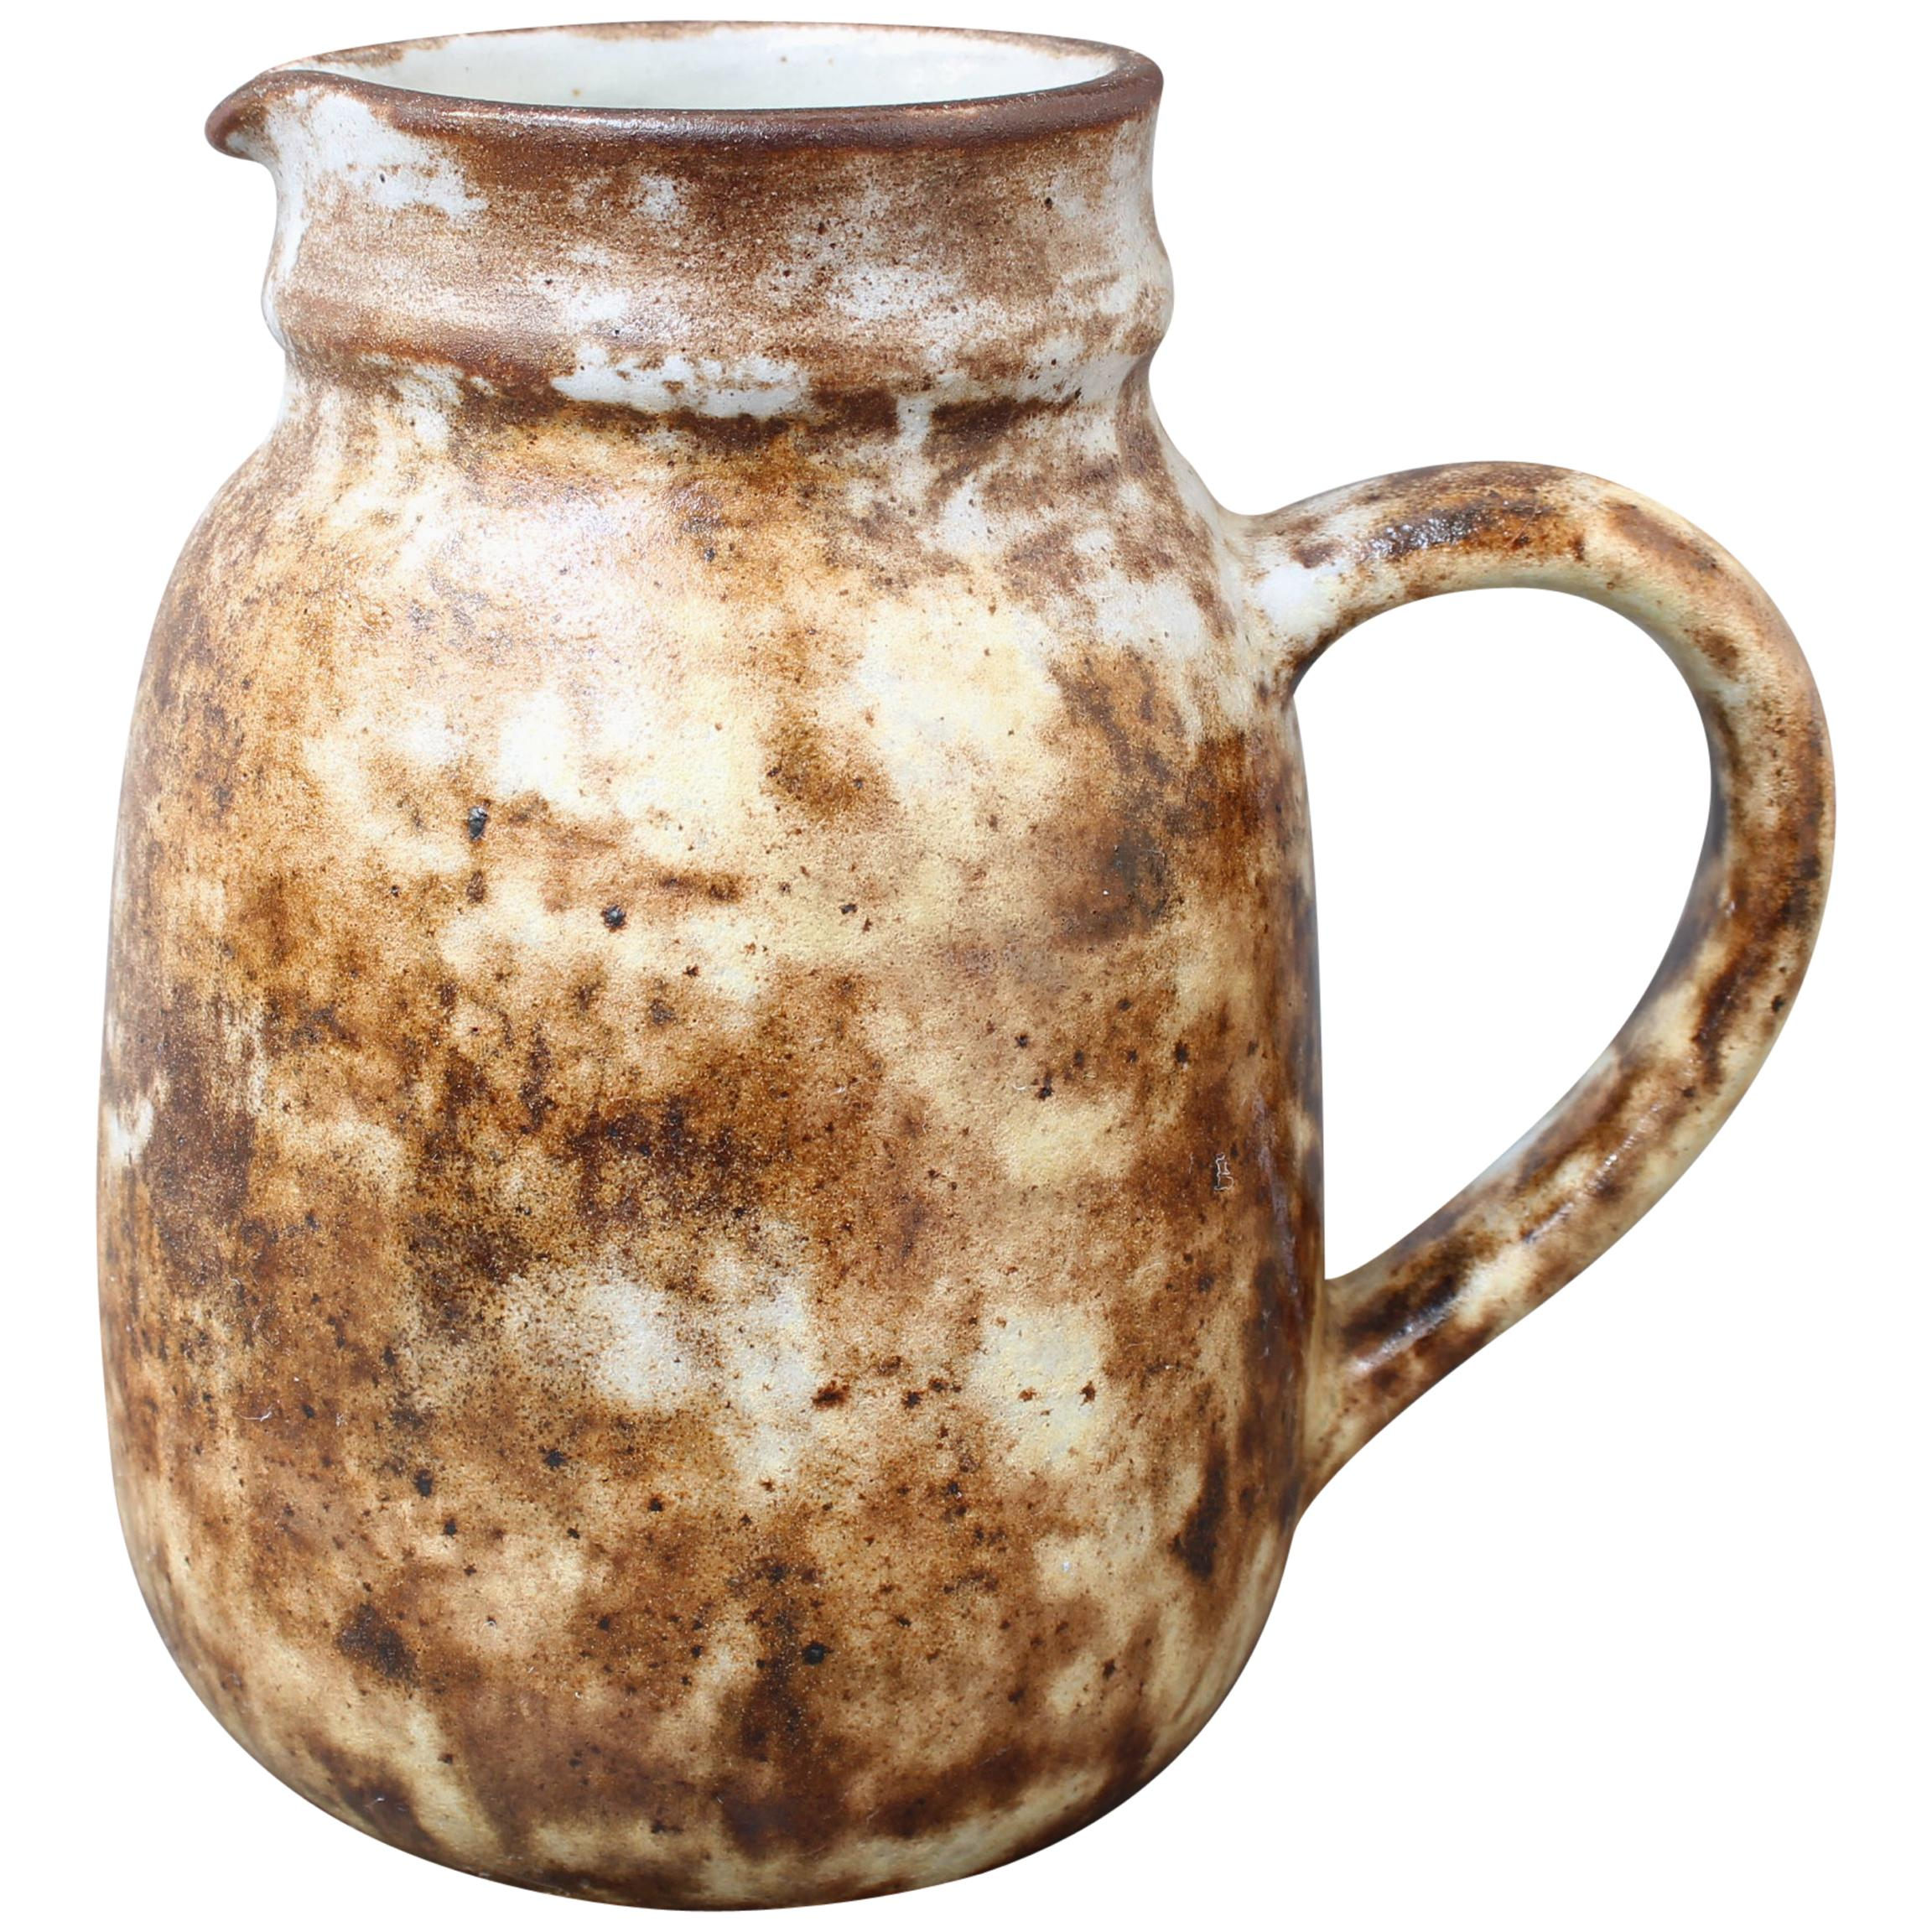 Midcentury French Ceramic Jug / Vase by Alexandre Kostanda, circa 1960s